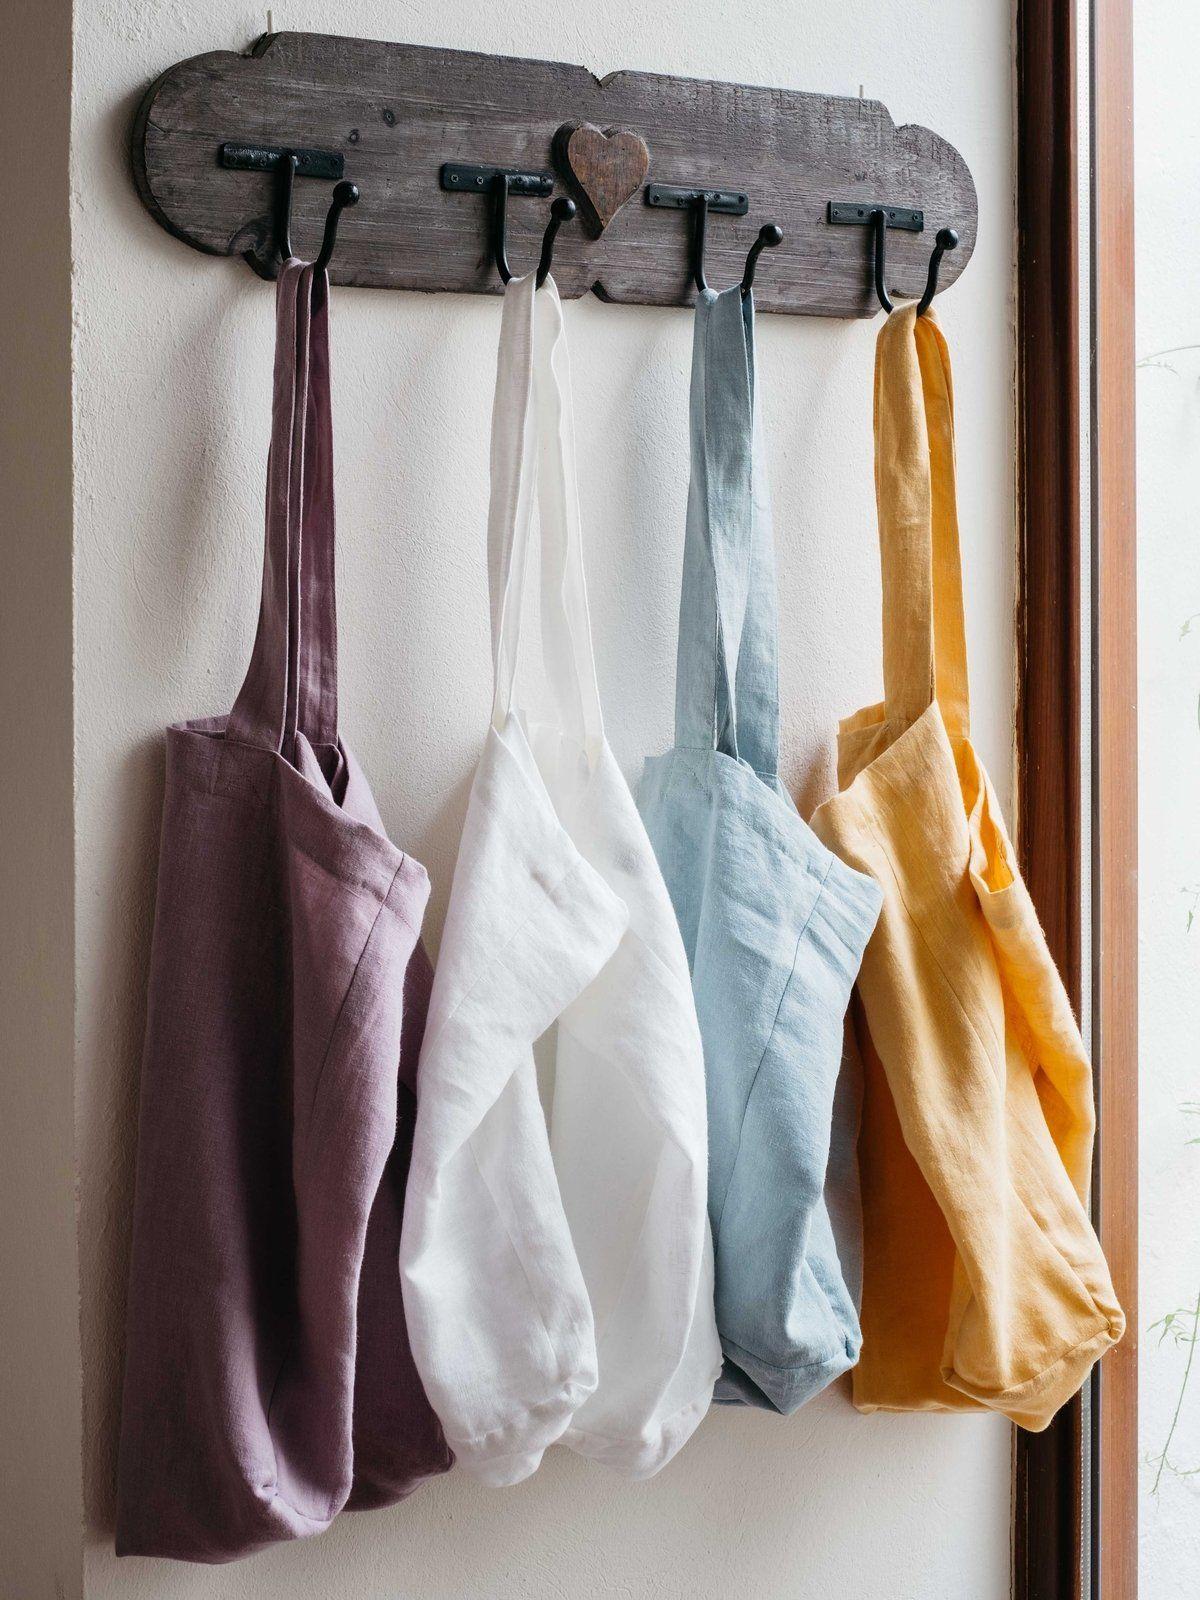 Bolsas de lino de colores